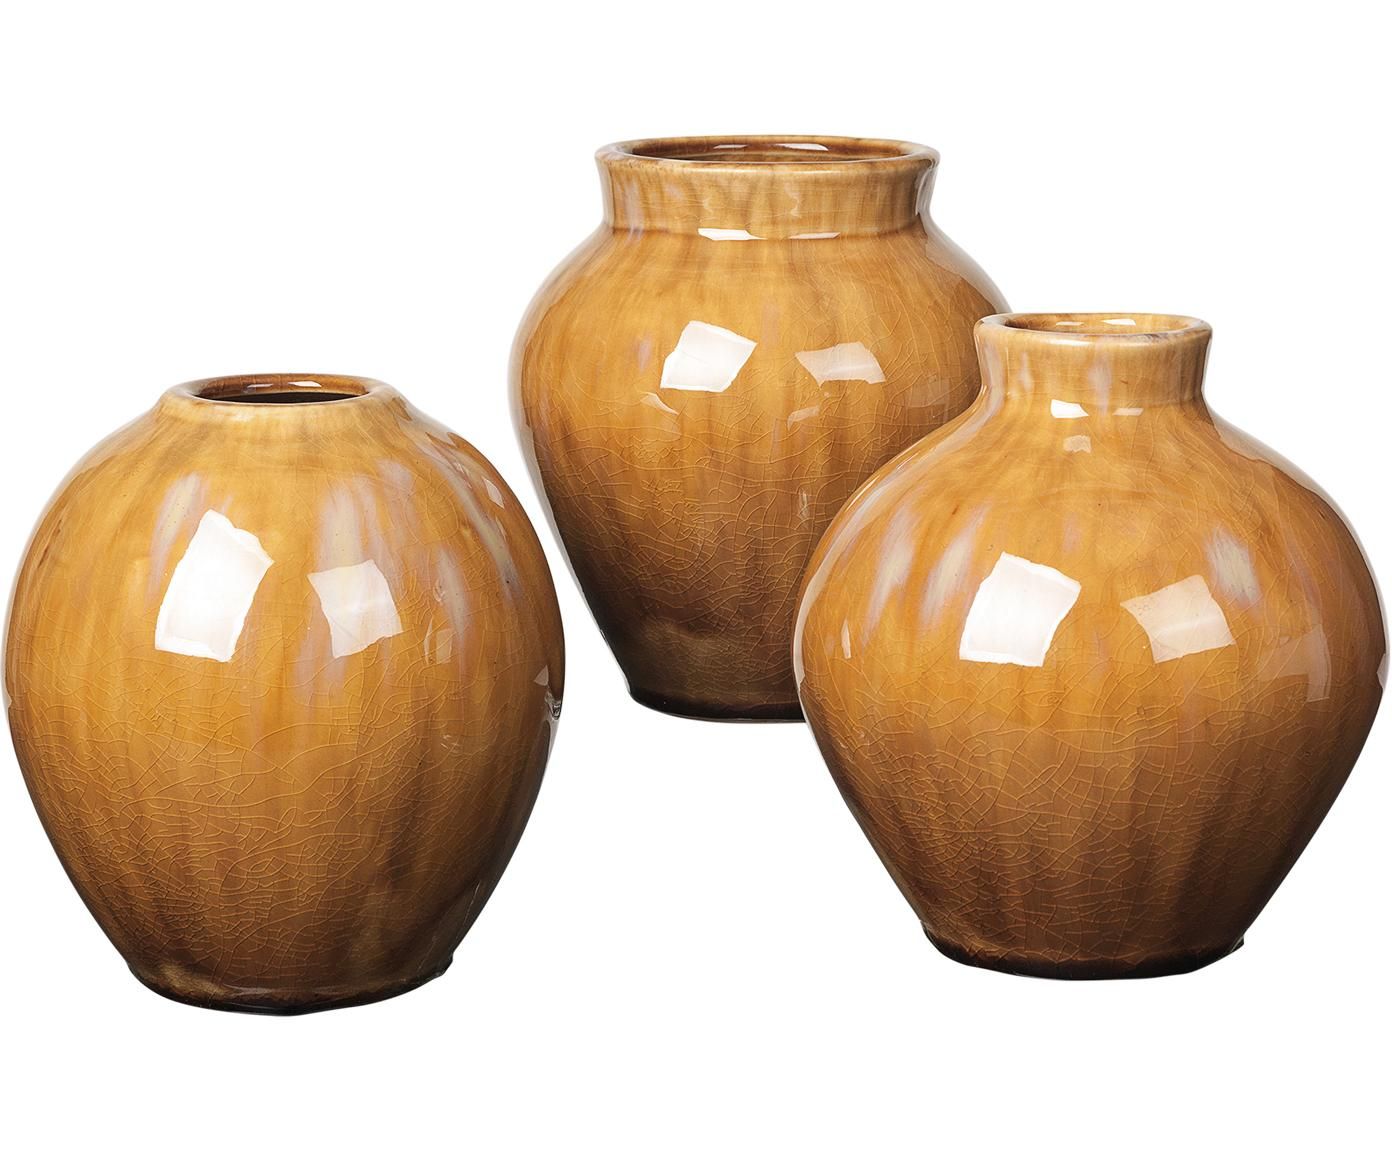 Set de jarrones de cerámica Ingrid, 3pzas., Cerámica, Marrón, Ø 14 x Al 14 cm